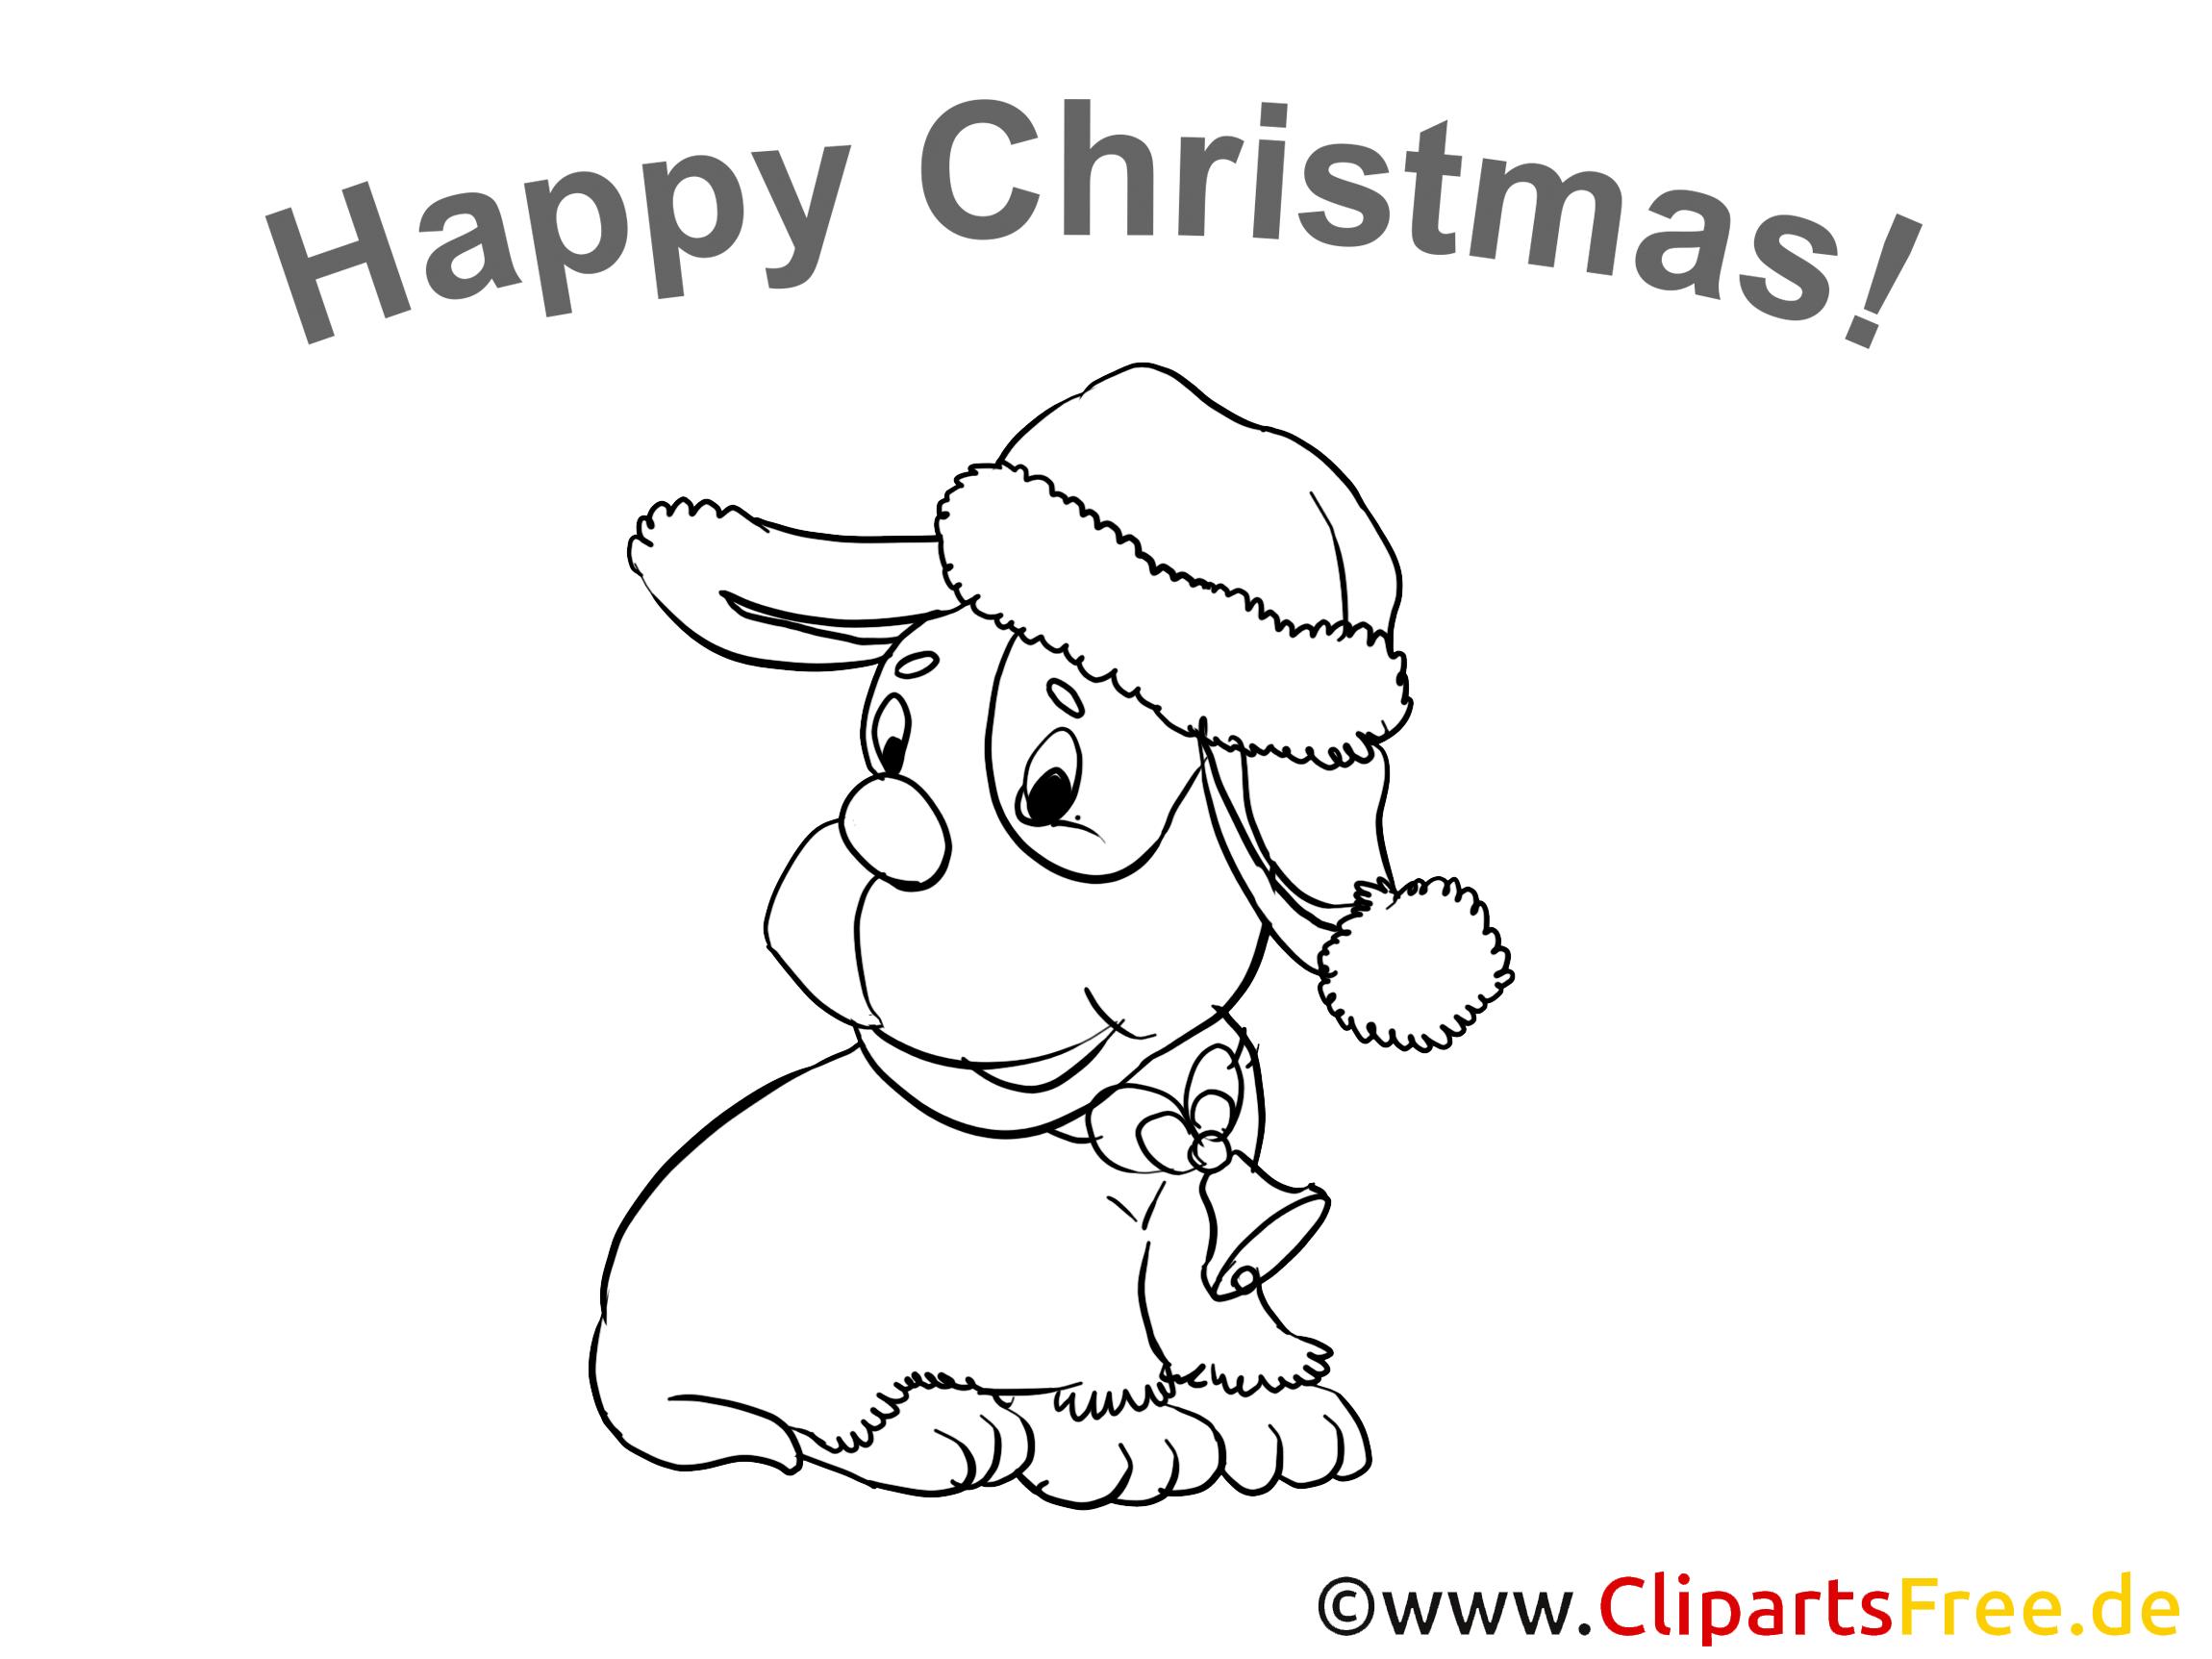 Happy Christmas Malvorlagen gratis